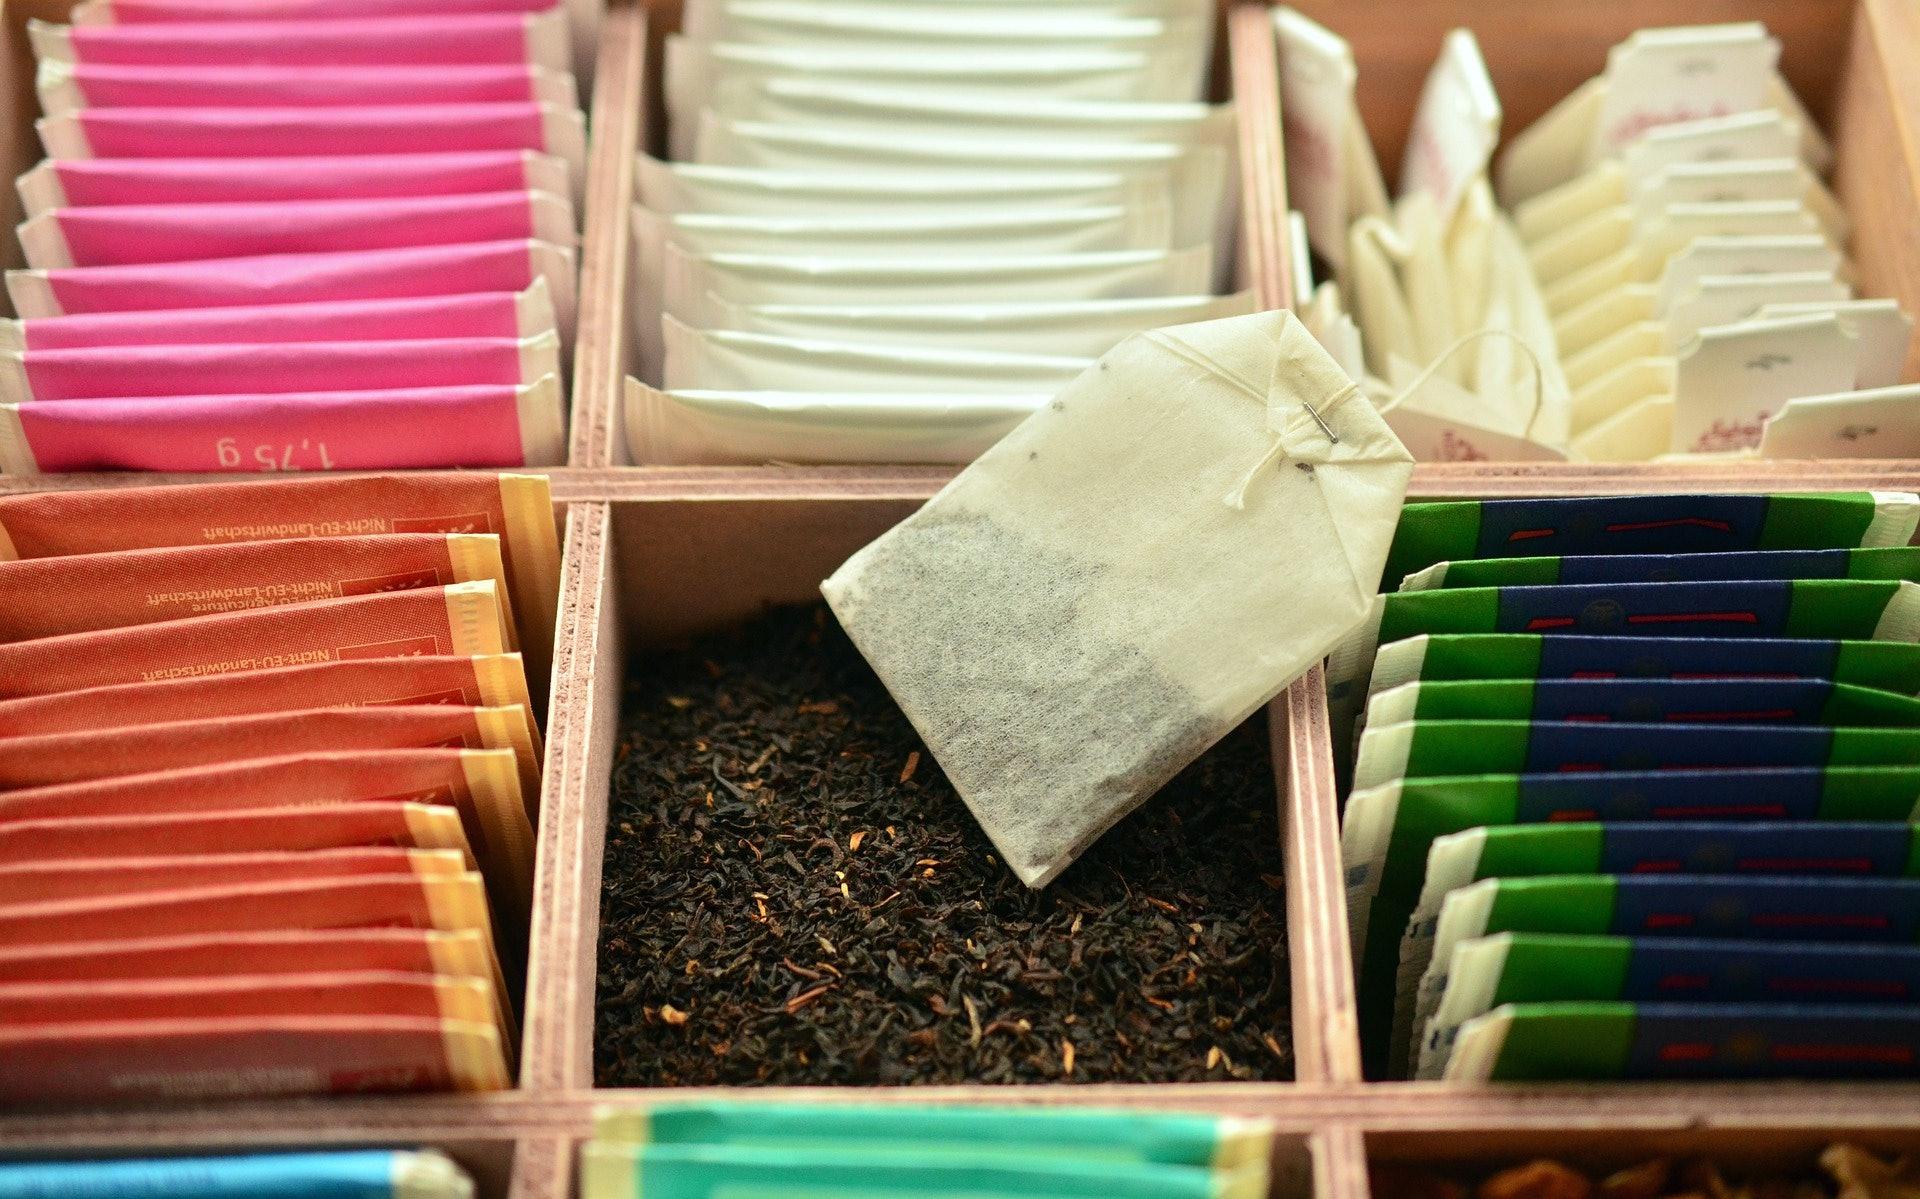 Does pure garcinia cambogia contain caffeine